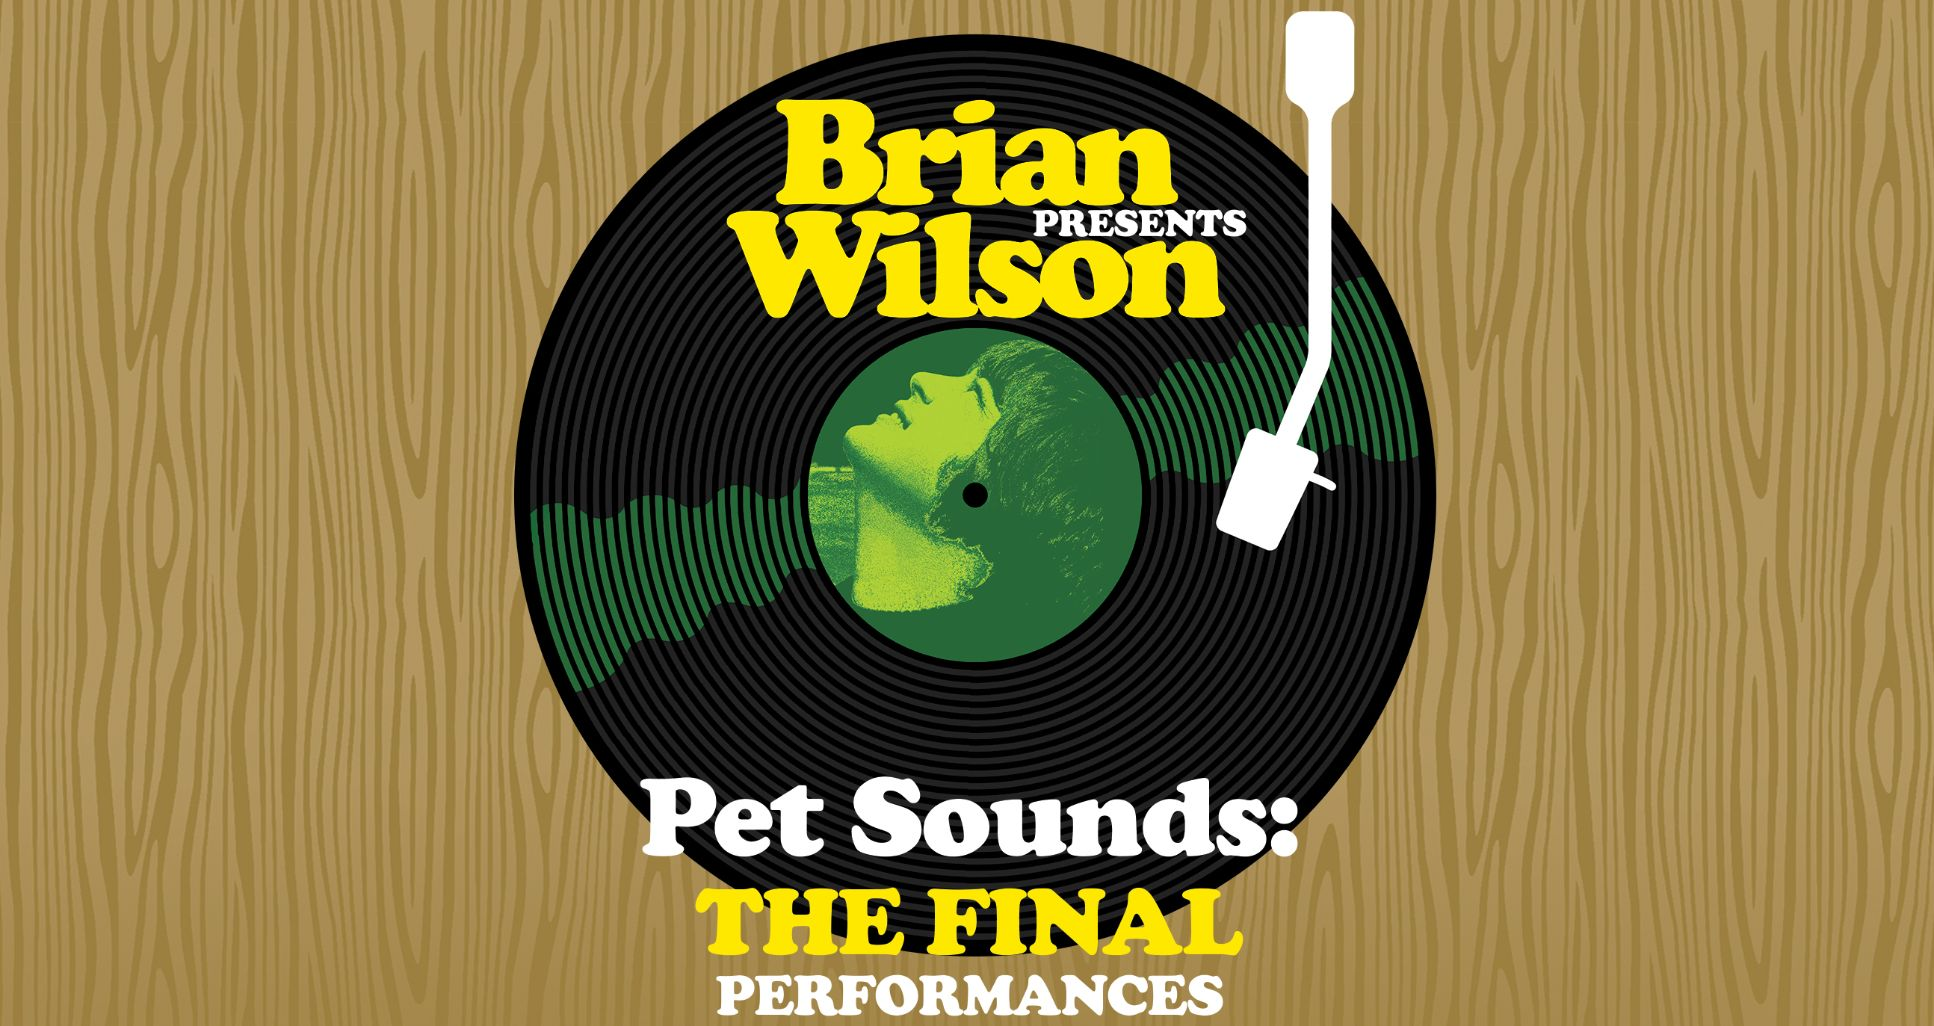 *RESCHEDULED* Brian Wilson presents Pet Sounds: The Final Performances